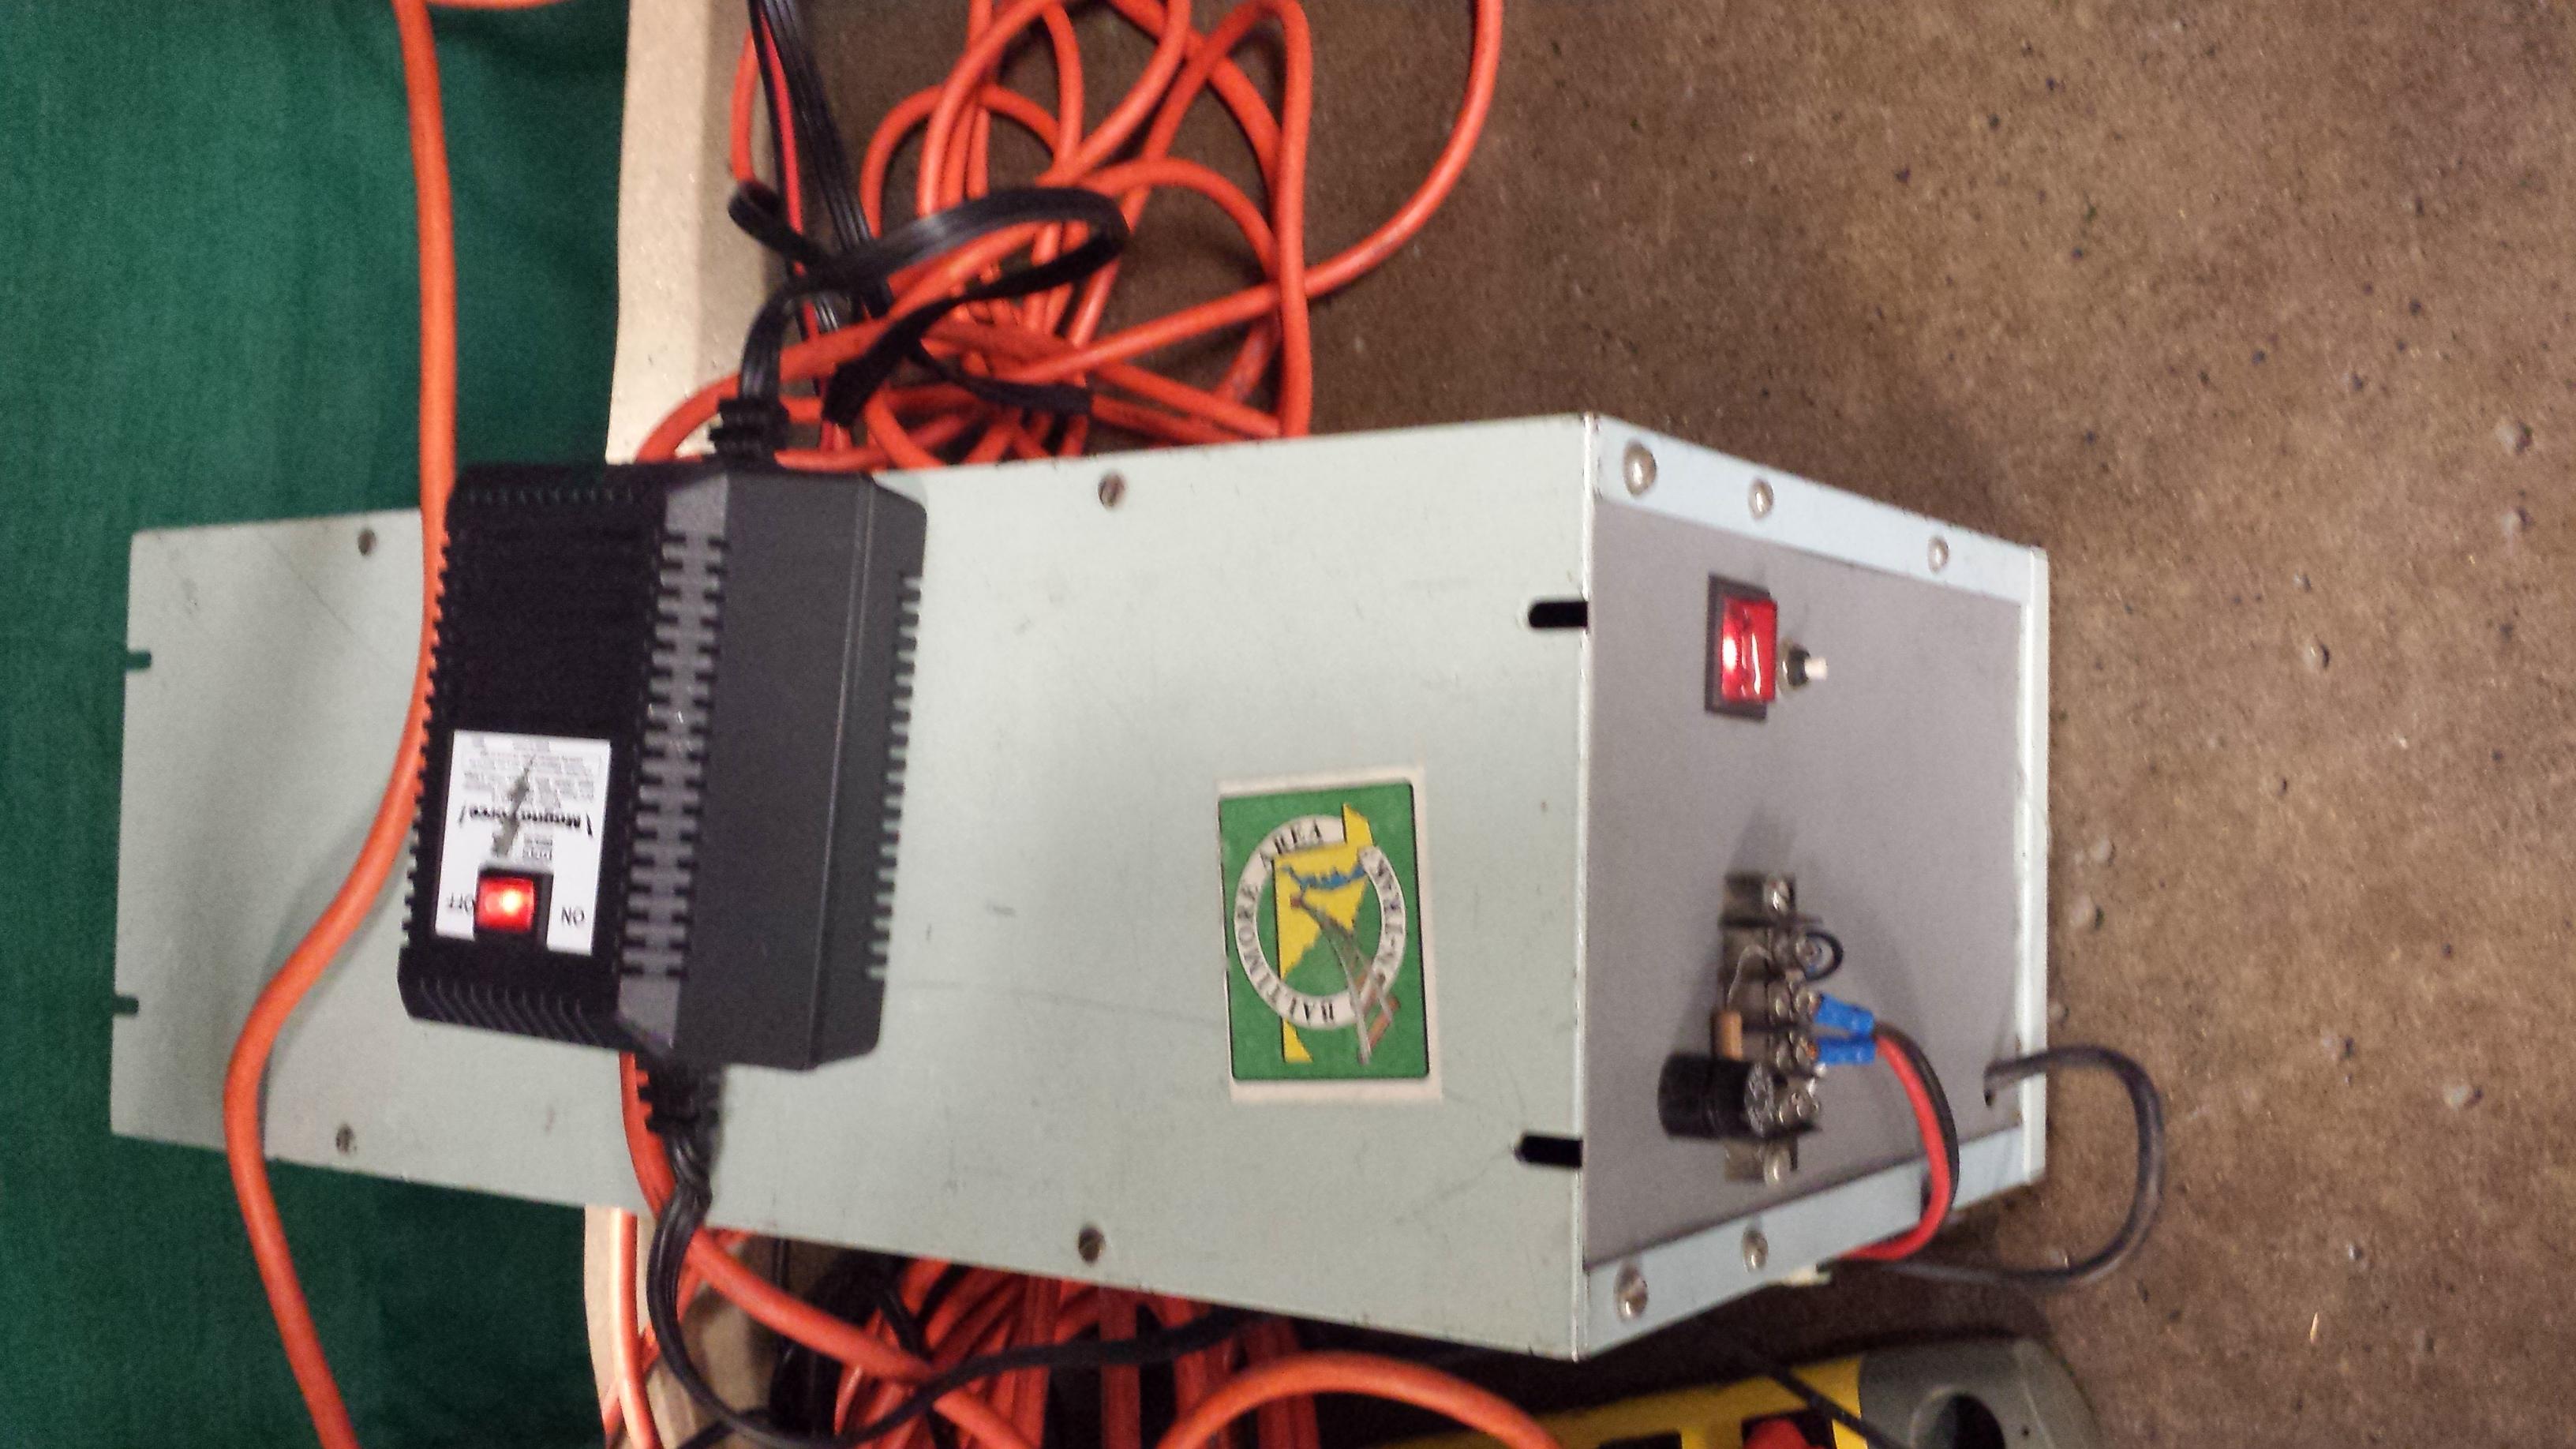 Bantrak Dcc Power Up Down Loconet Wiring Diagram Photo